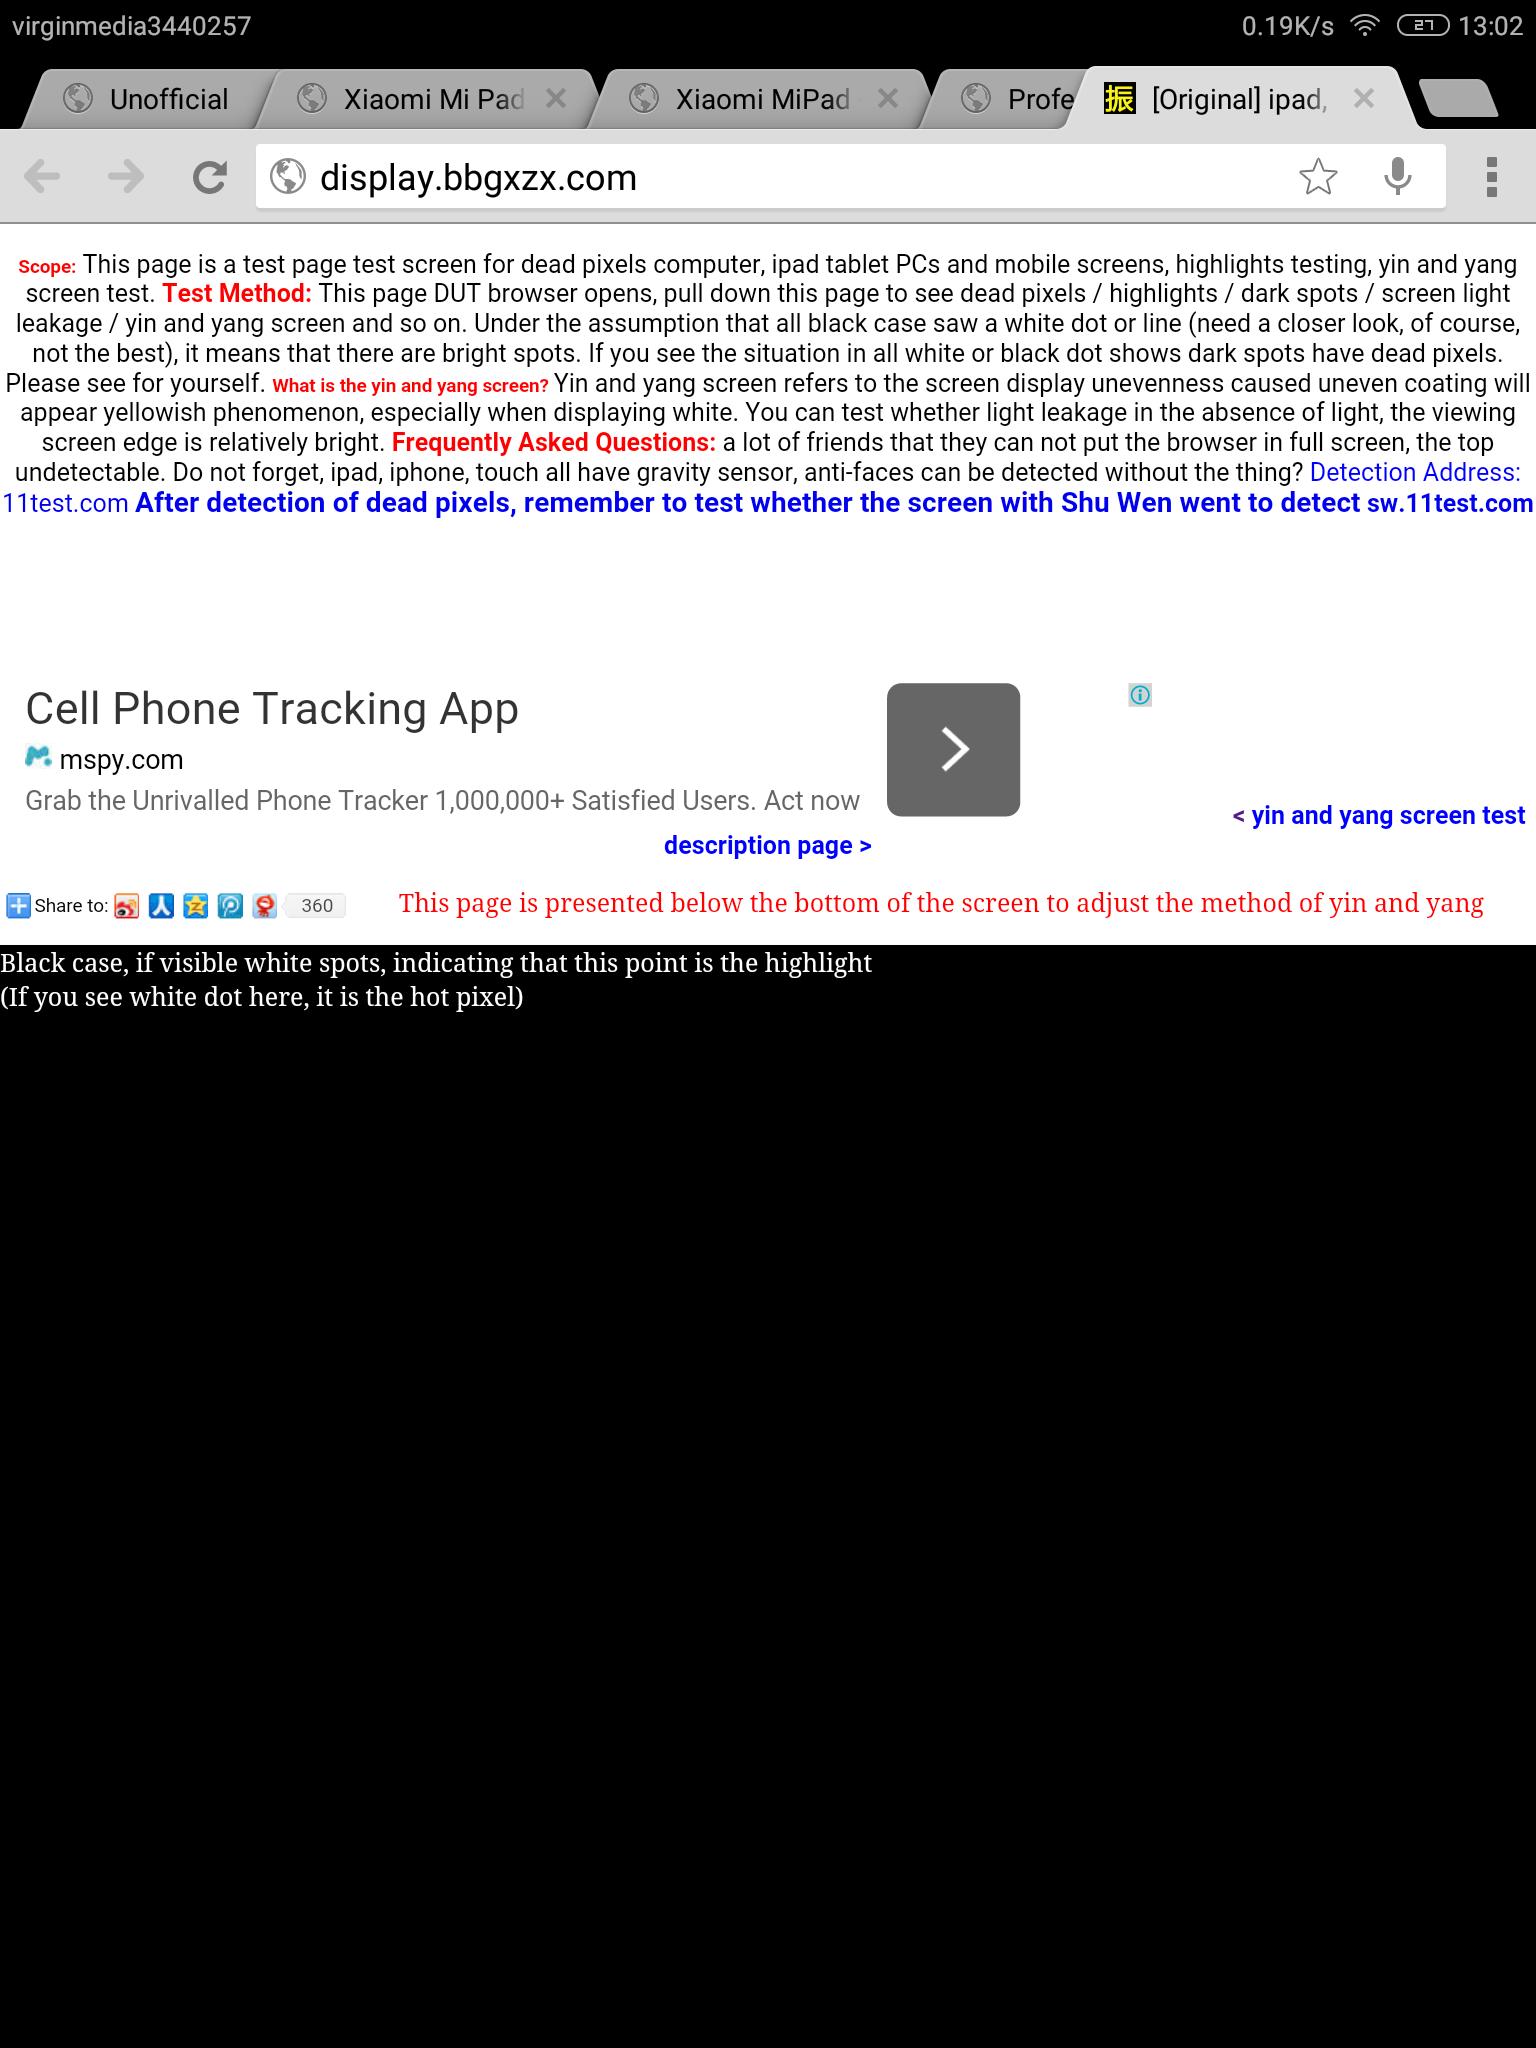 Screenshot_2014-08-31-13-02-55.png